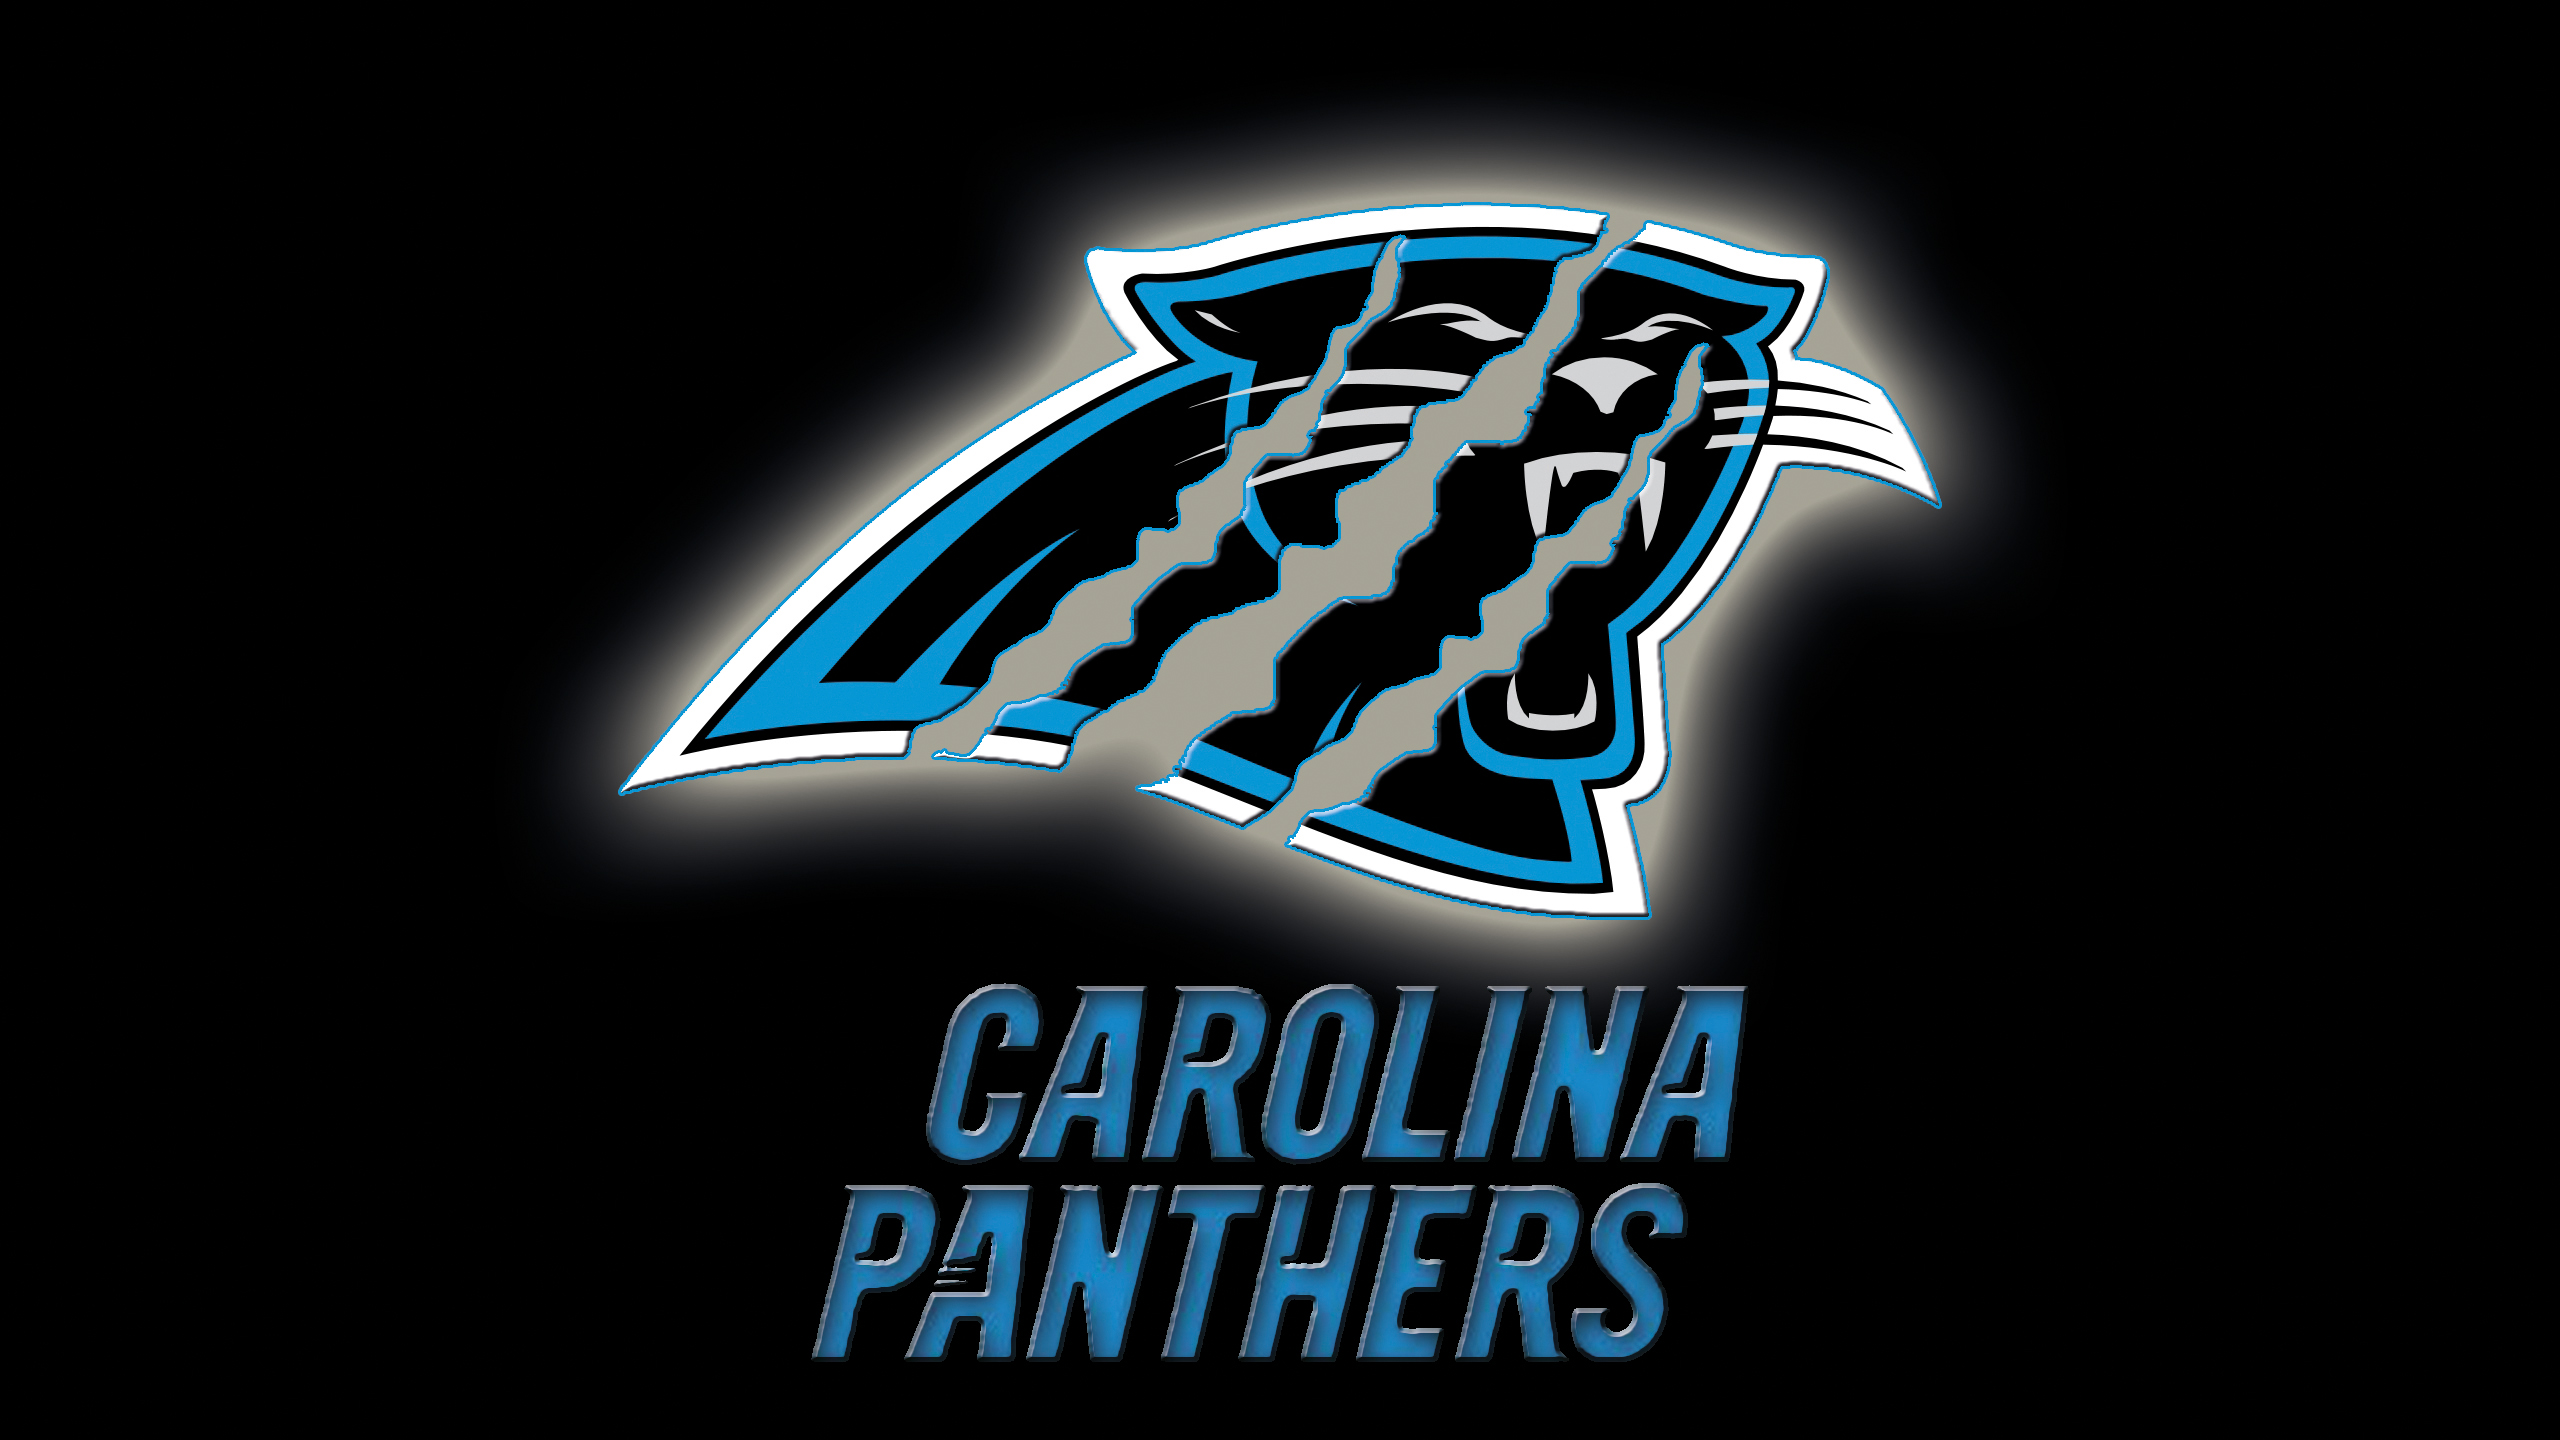 Carolina Panthers Logo Wallpaper HD | PixelsTalk Net